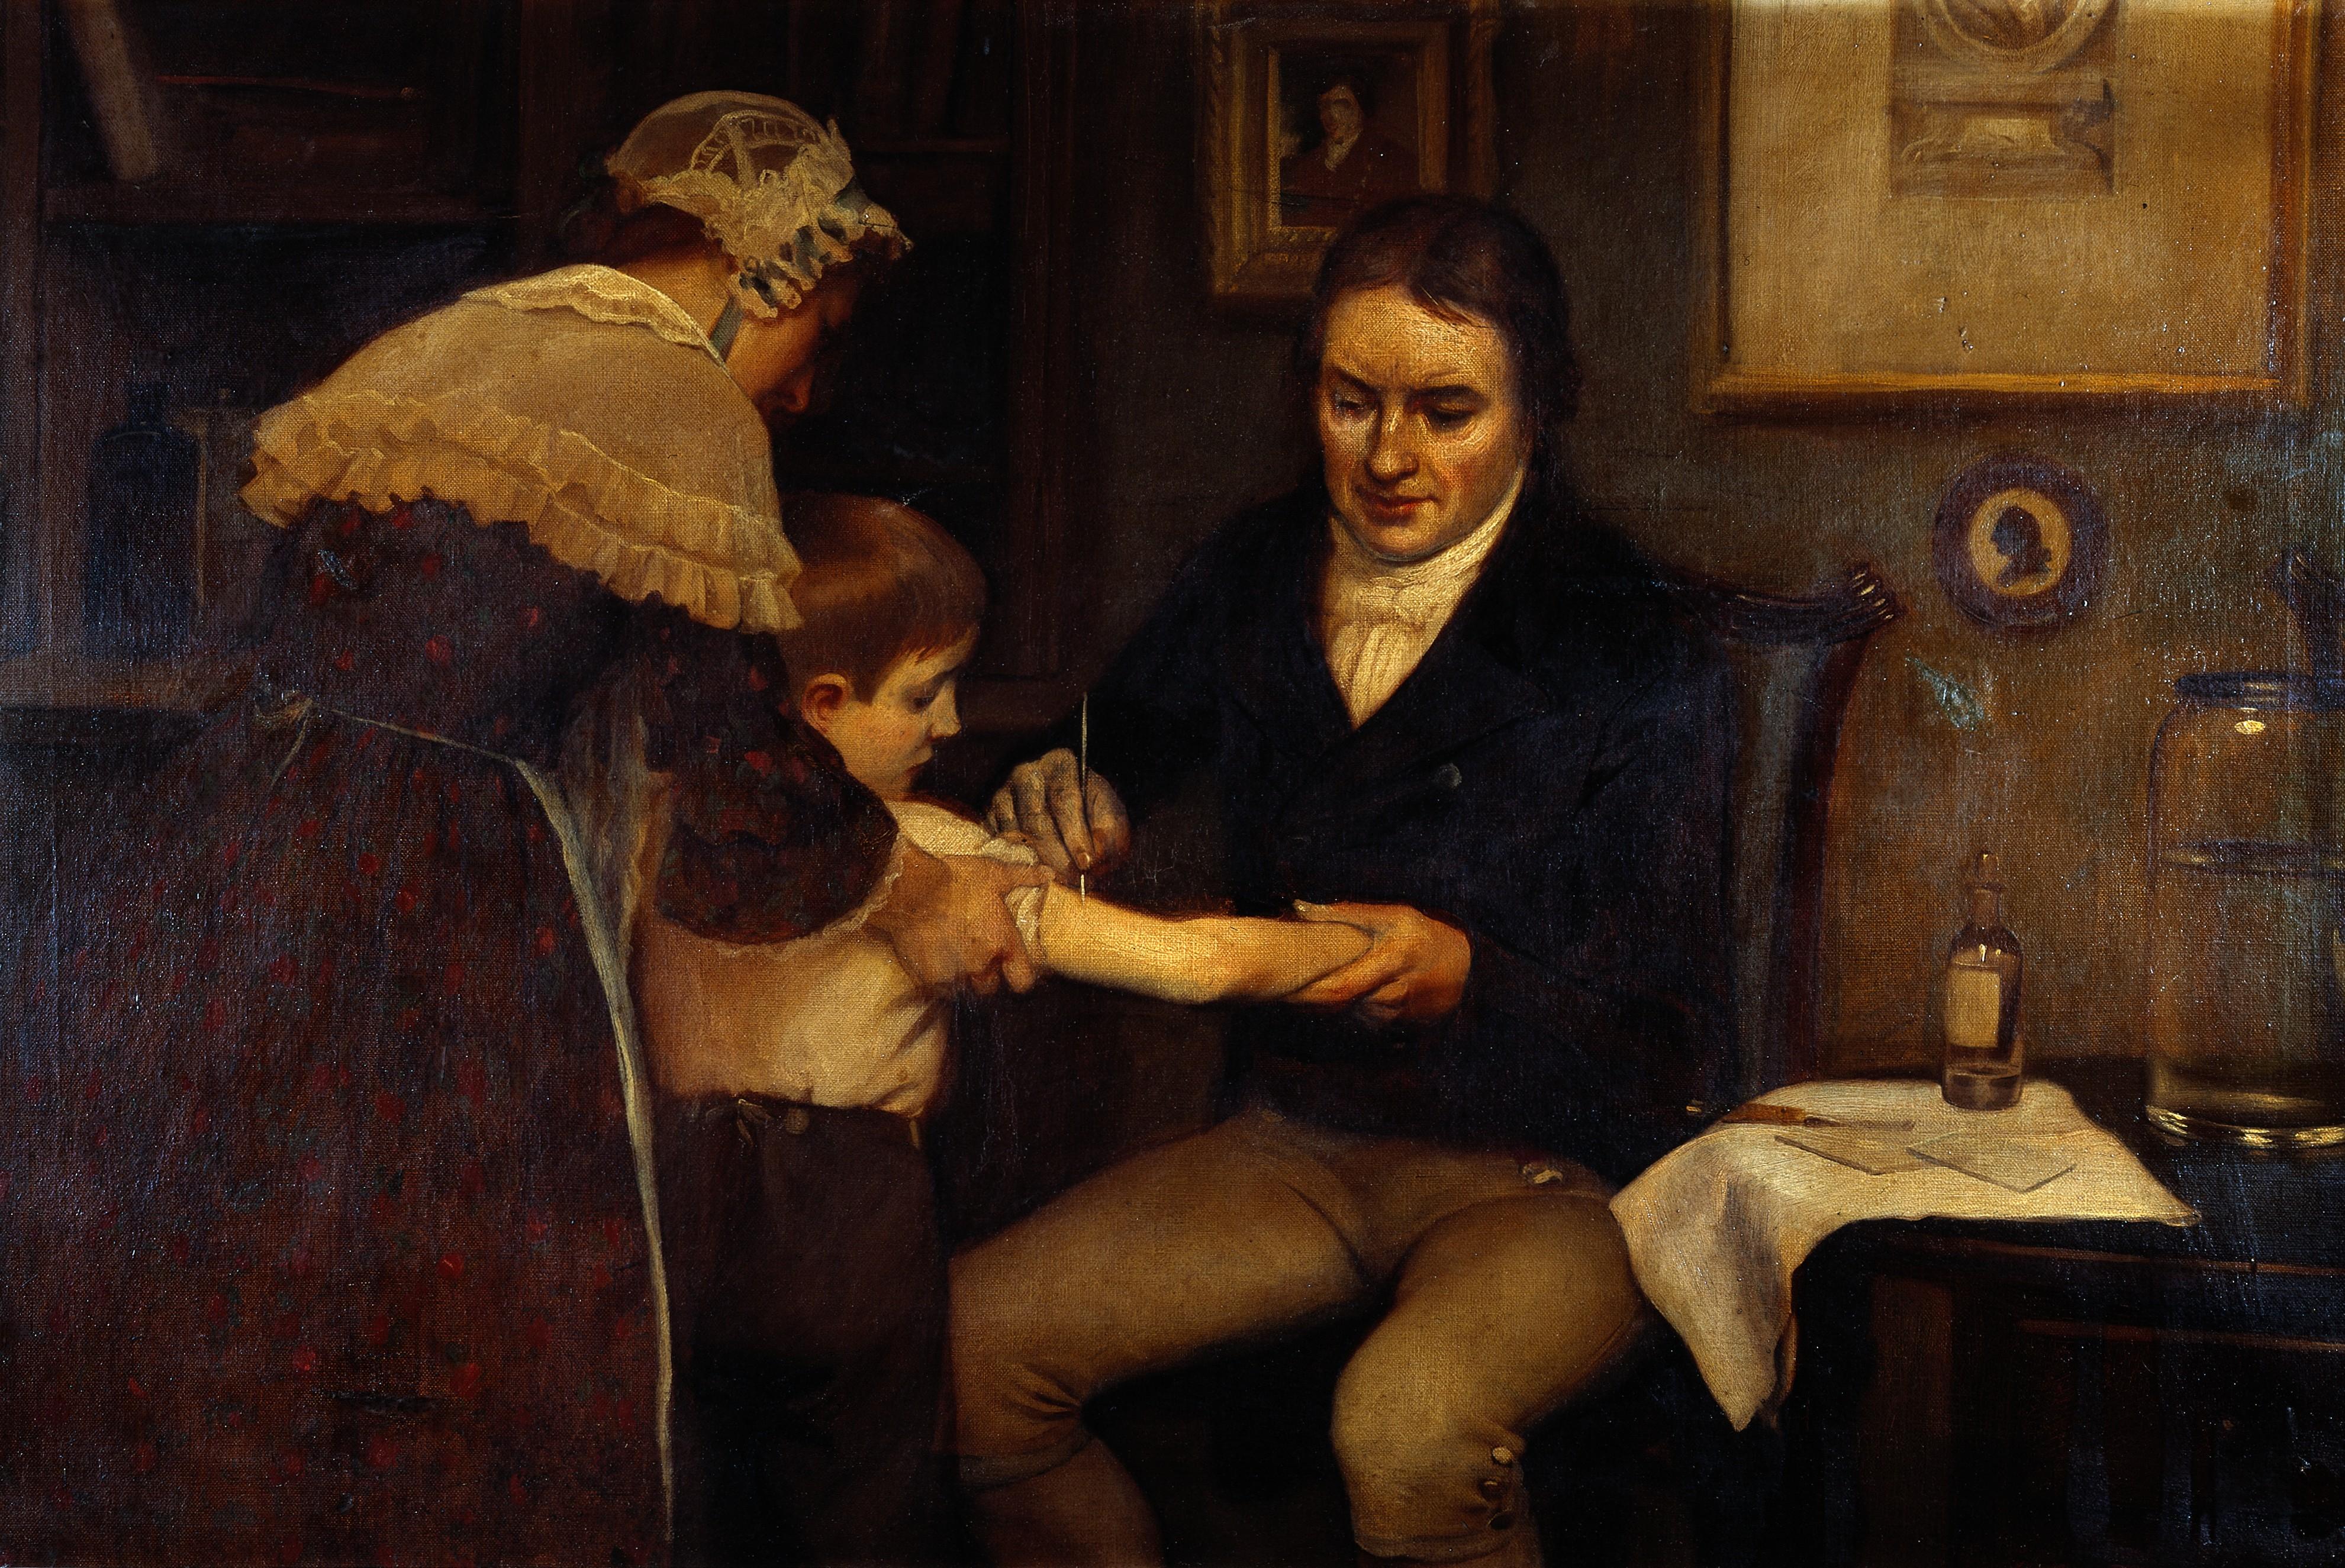 Jenner tests smallpox vaccine